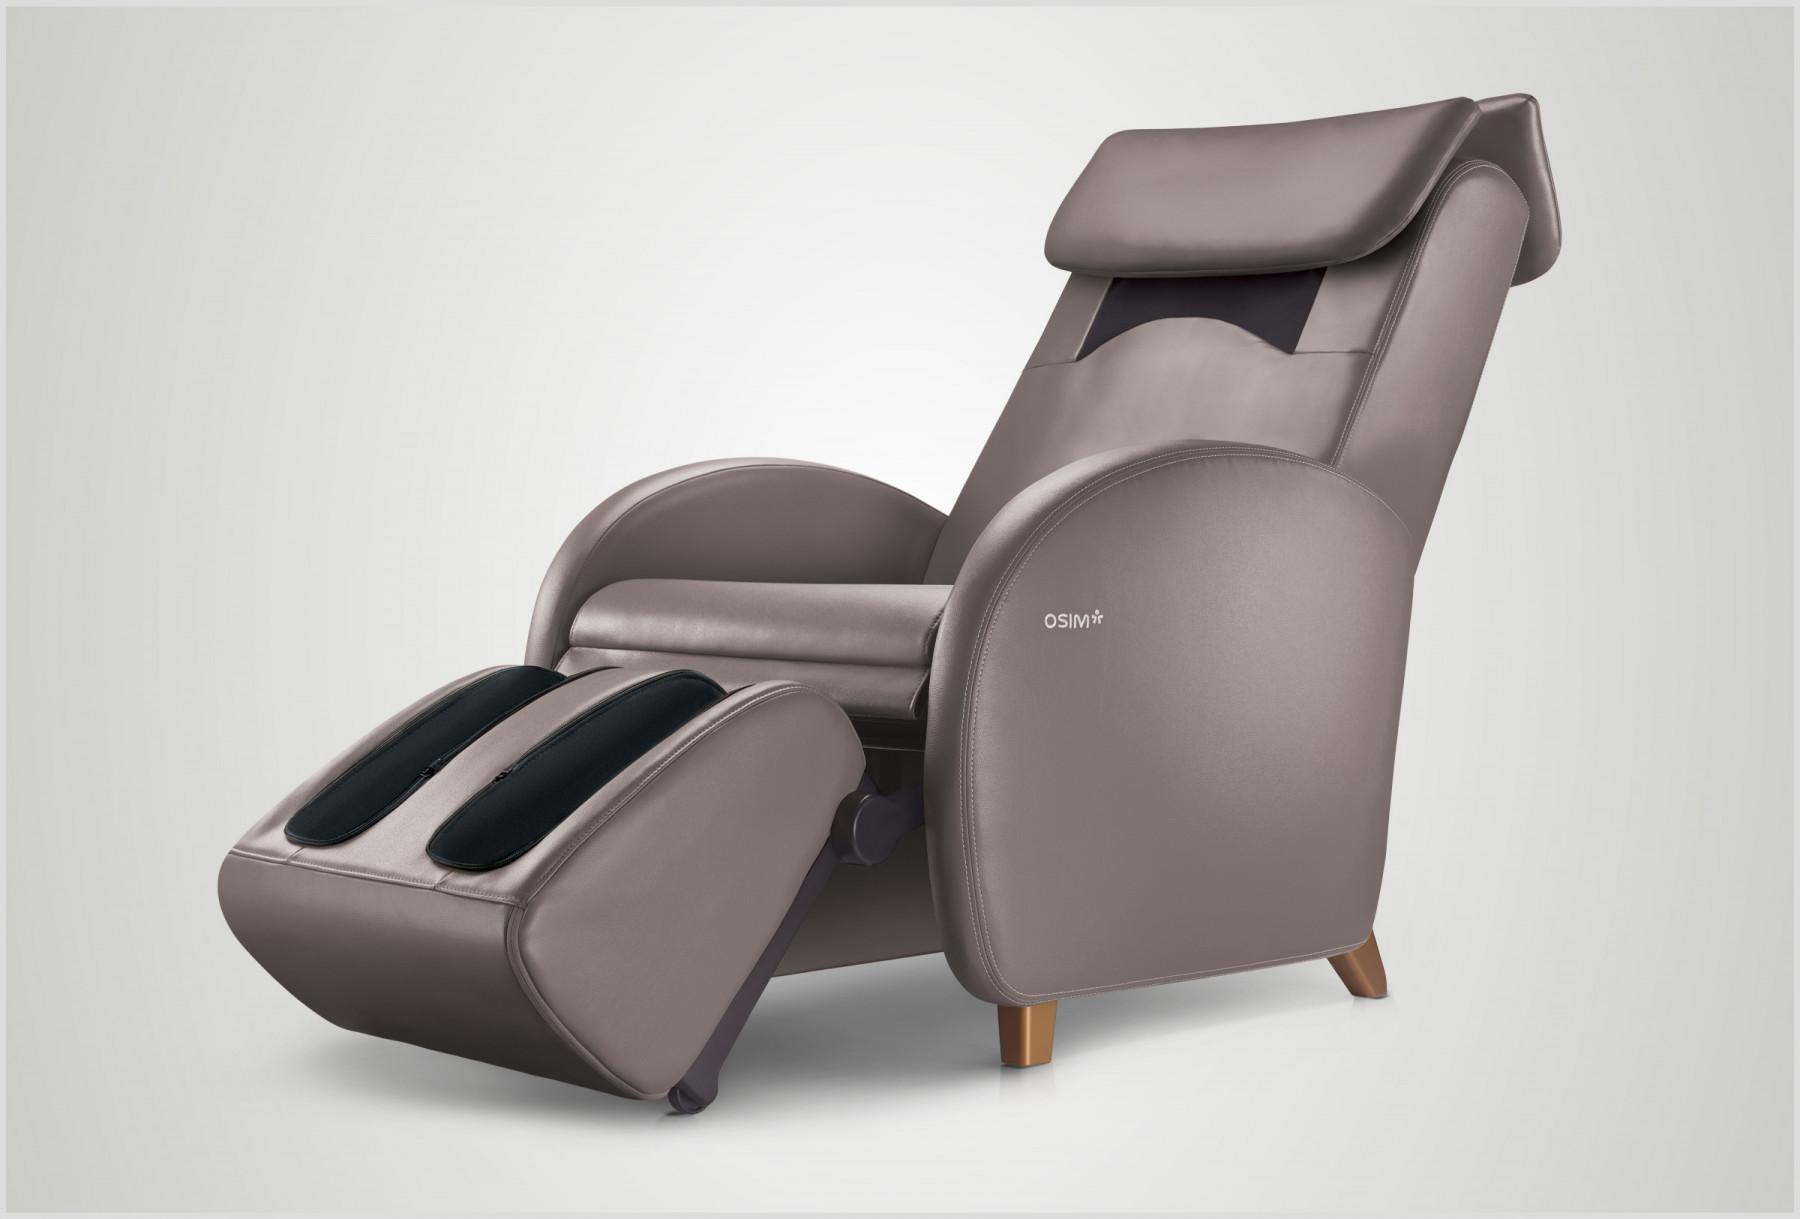 Osim massage chair price - More Views Udiva Classic Massage Sofa My 1st Osim Massage Chair